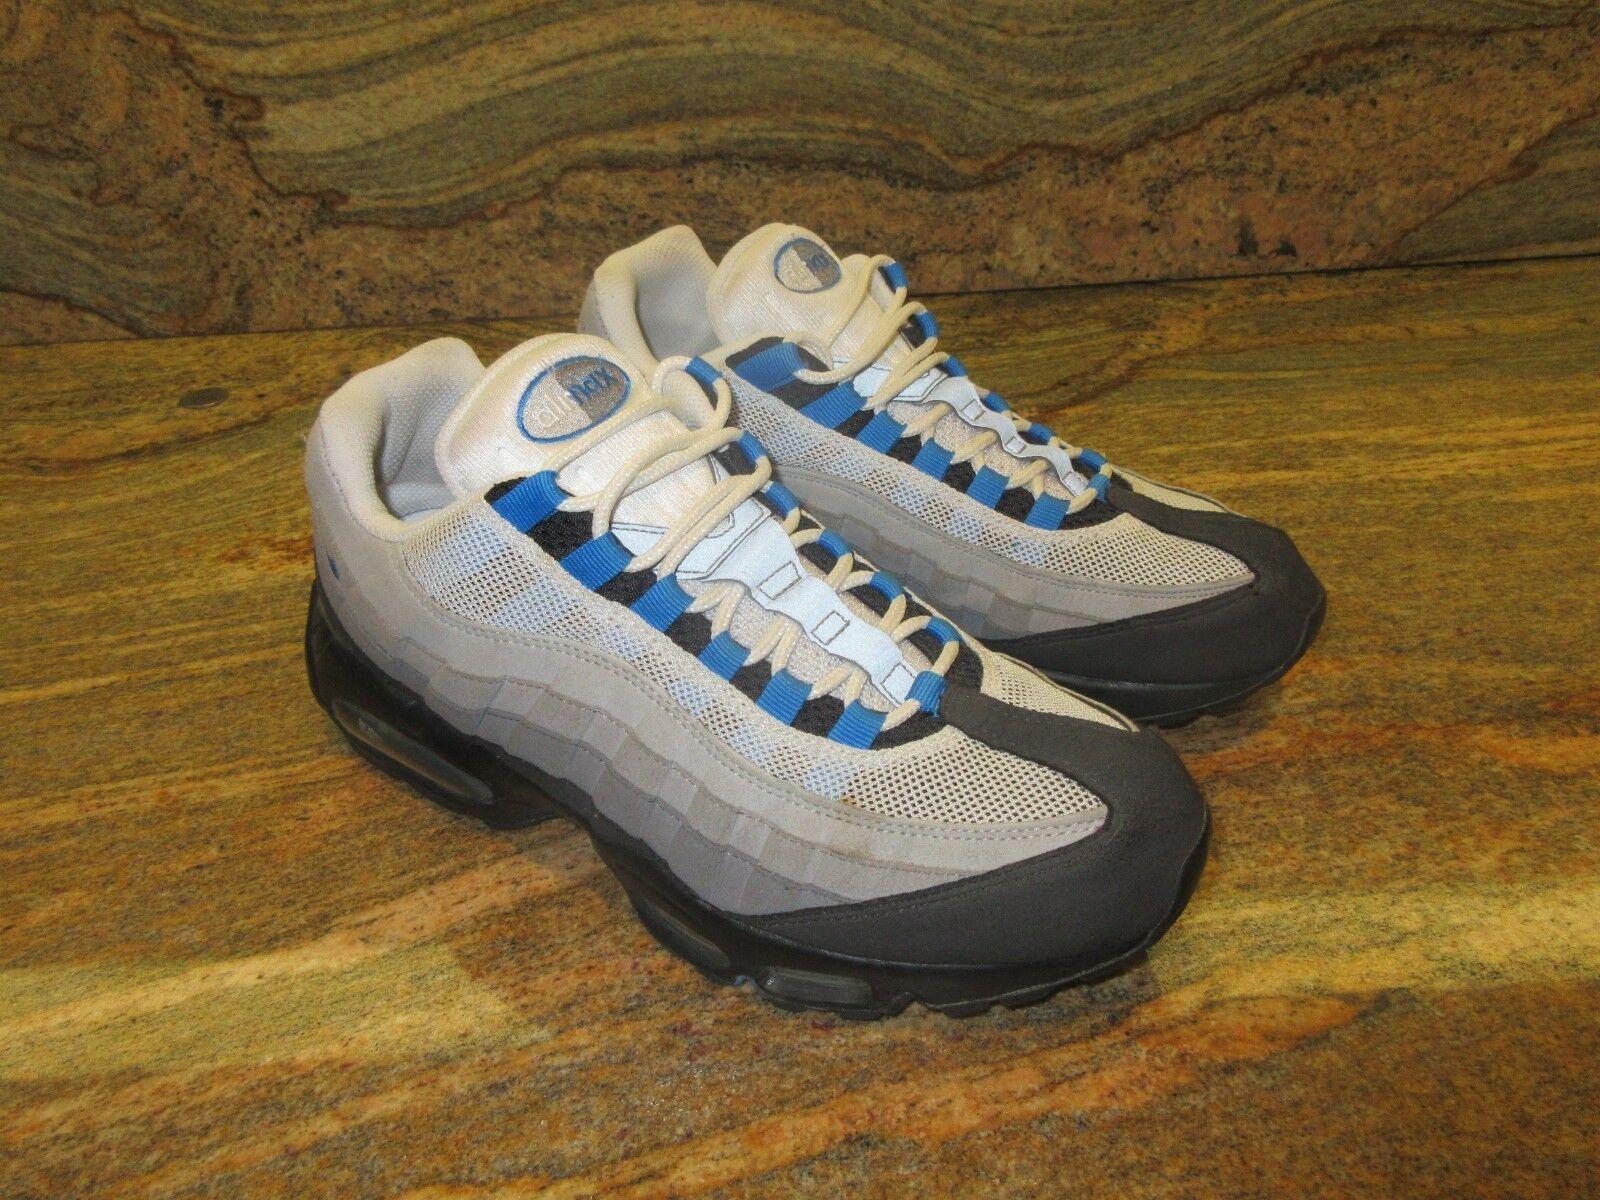 2010 Nike Air Max 95 OG SZ 9.5 9.5 9.5 Natural grigio Photo blu NRG PRM QS 609048-034 fc9c03